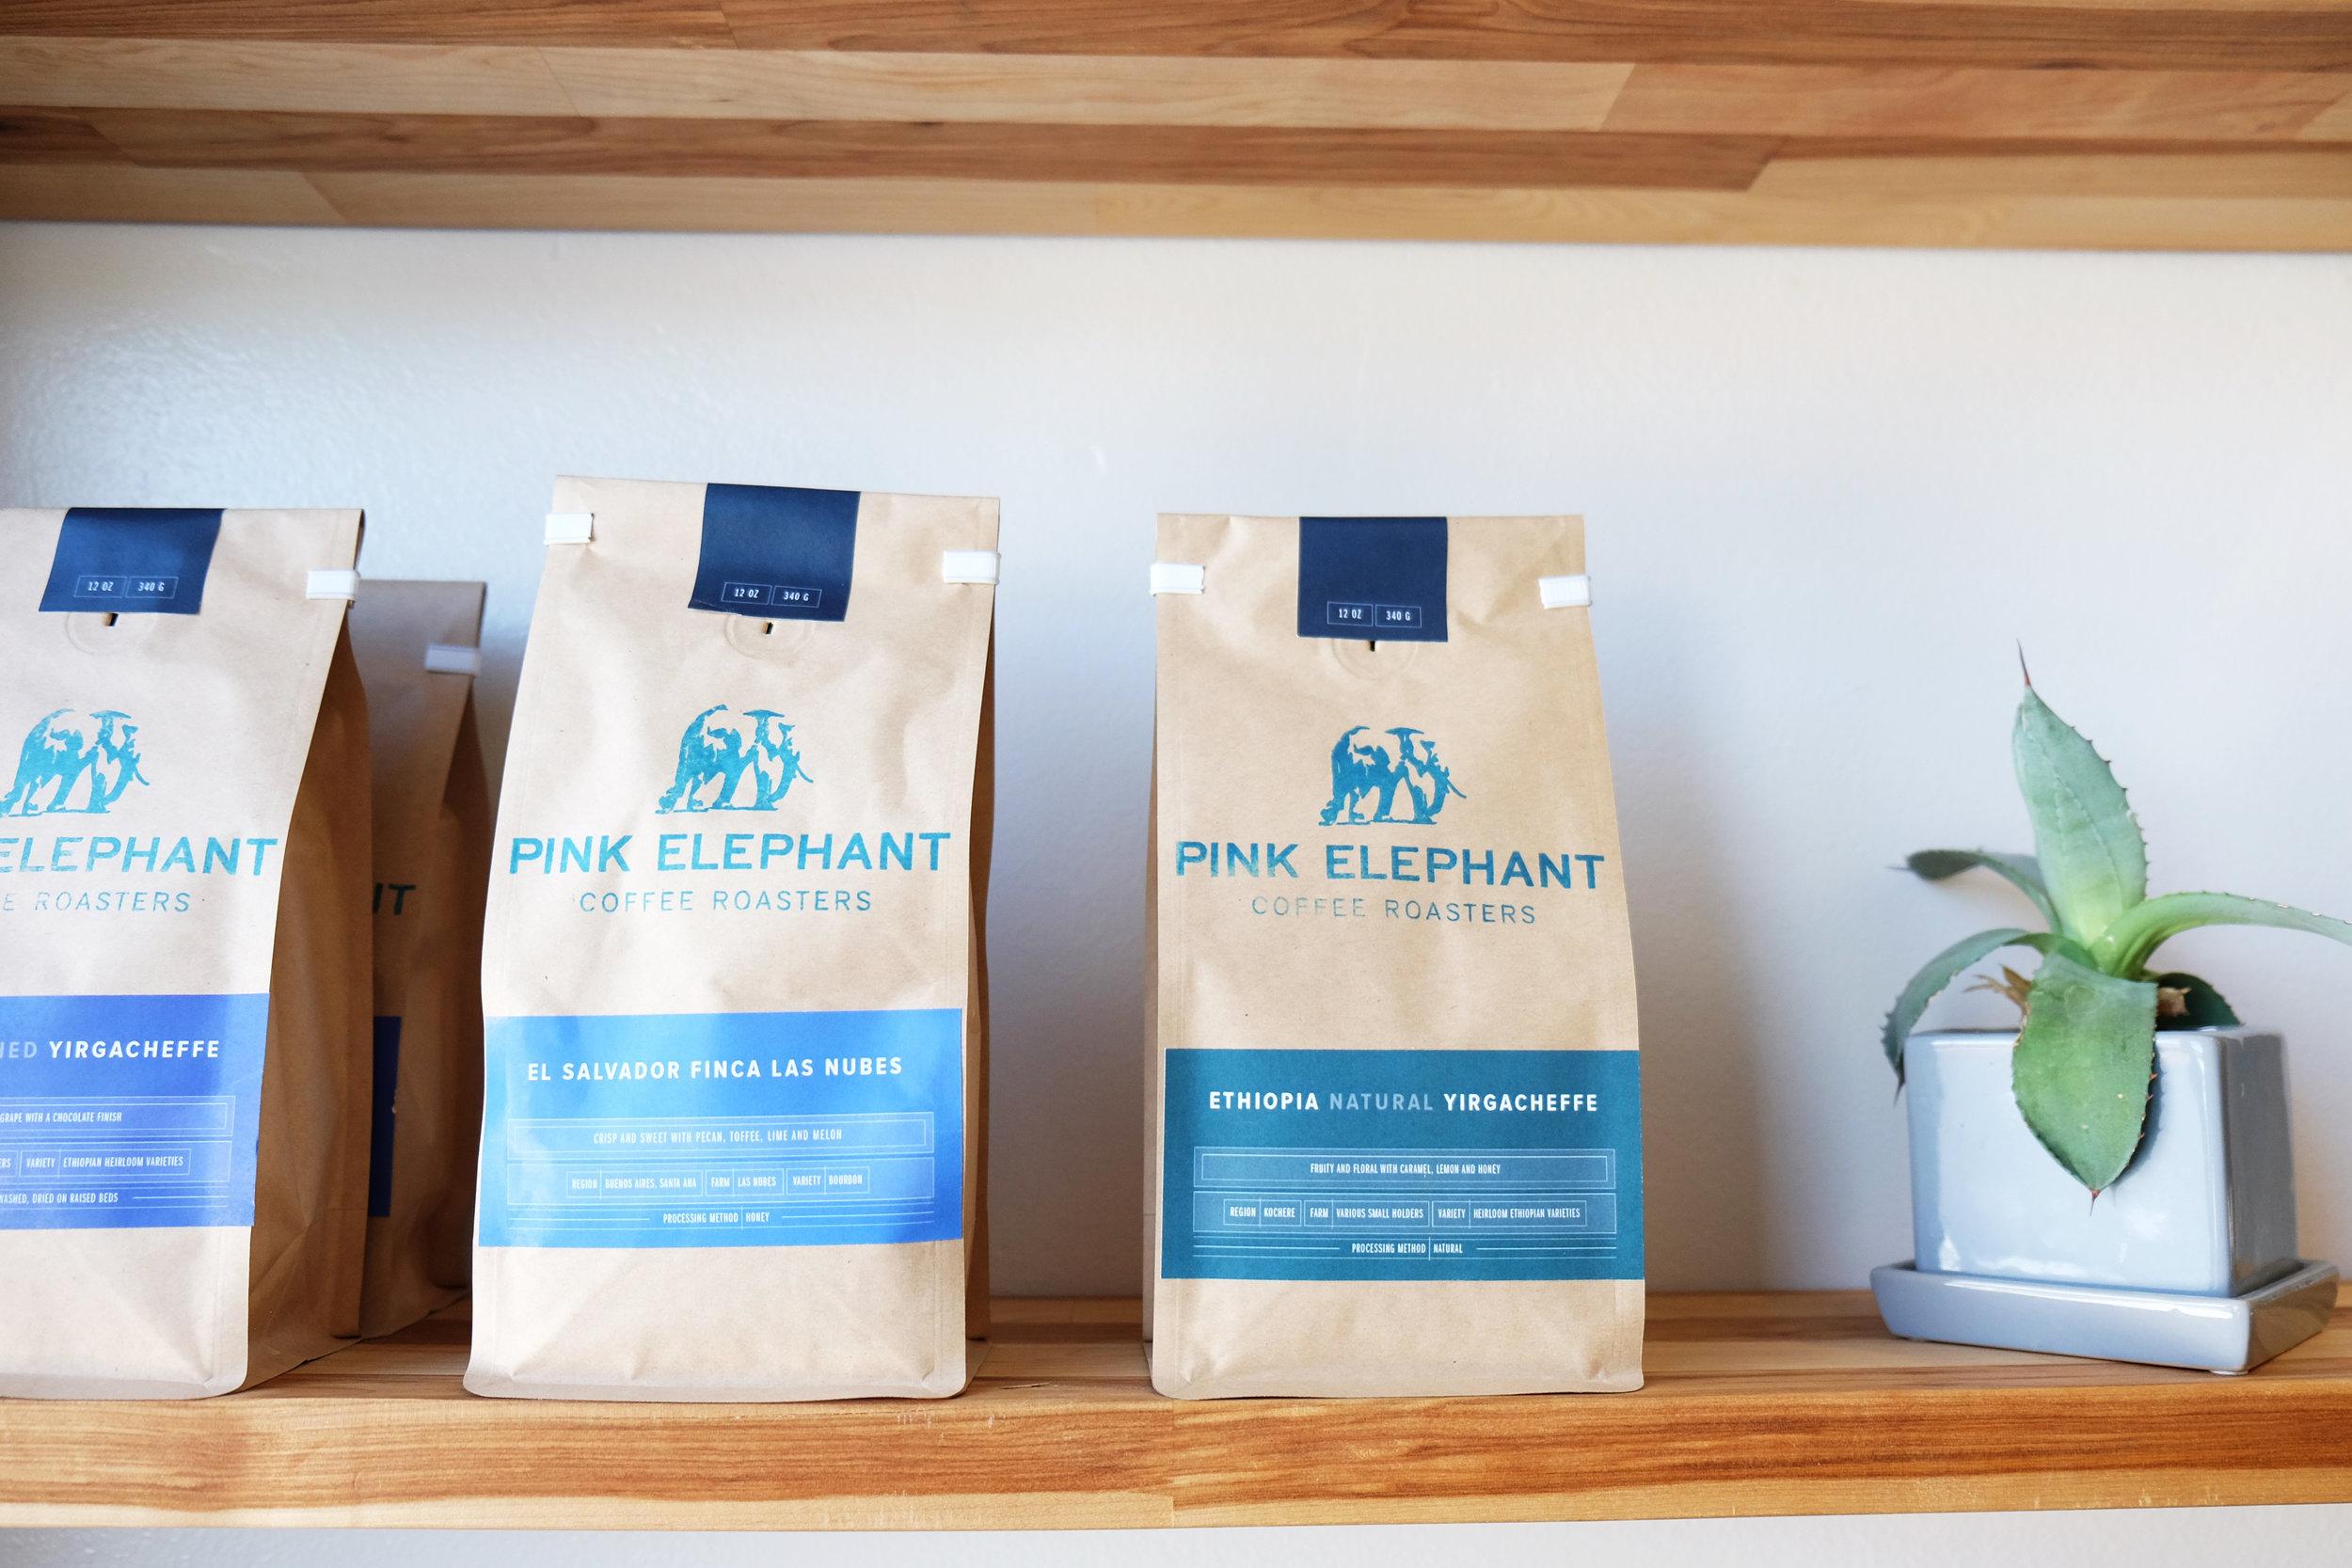 PINK ELEPHANT COFFEE